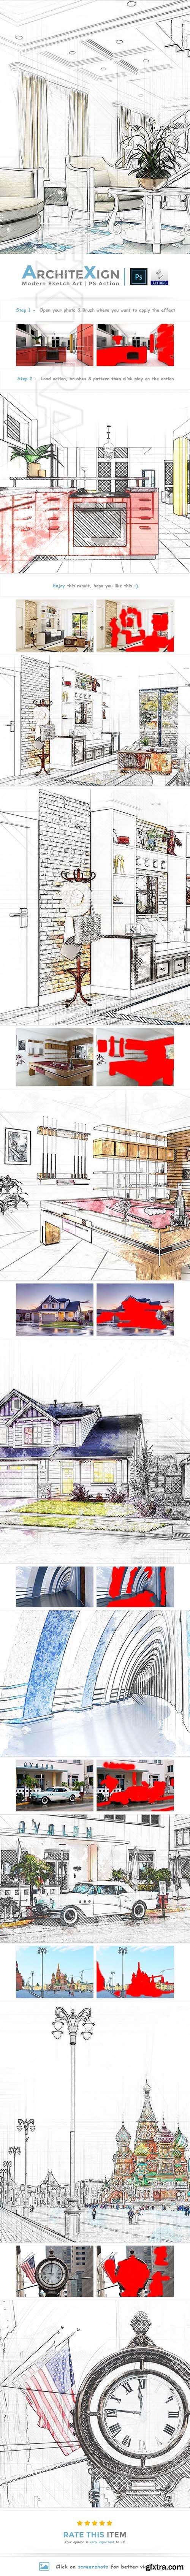 GraphicRiver - Architexign - Modern Sketch Art PS Action 23165483